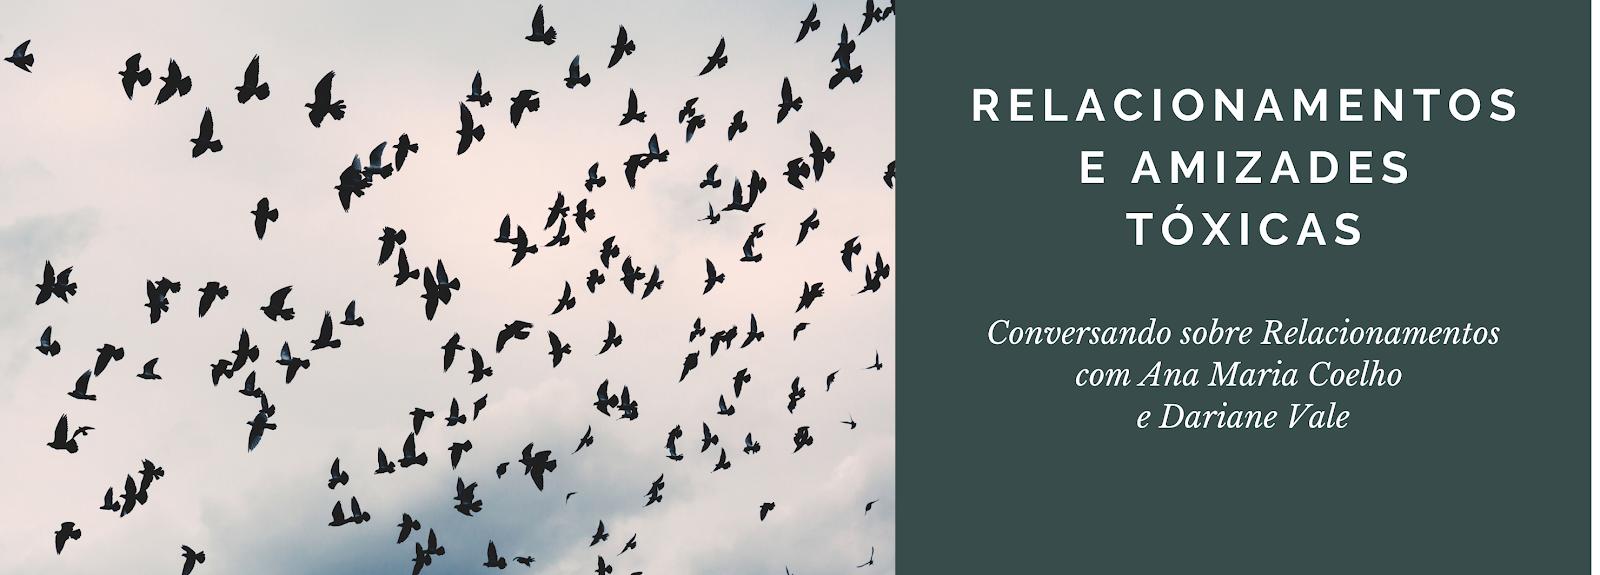 Conversando sobre Relacionamentos: Relacionamentos e Amizades Tóxicas